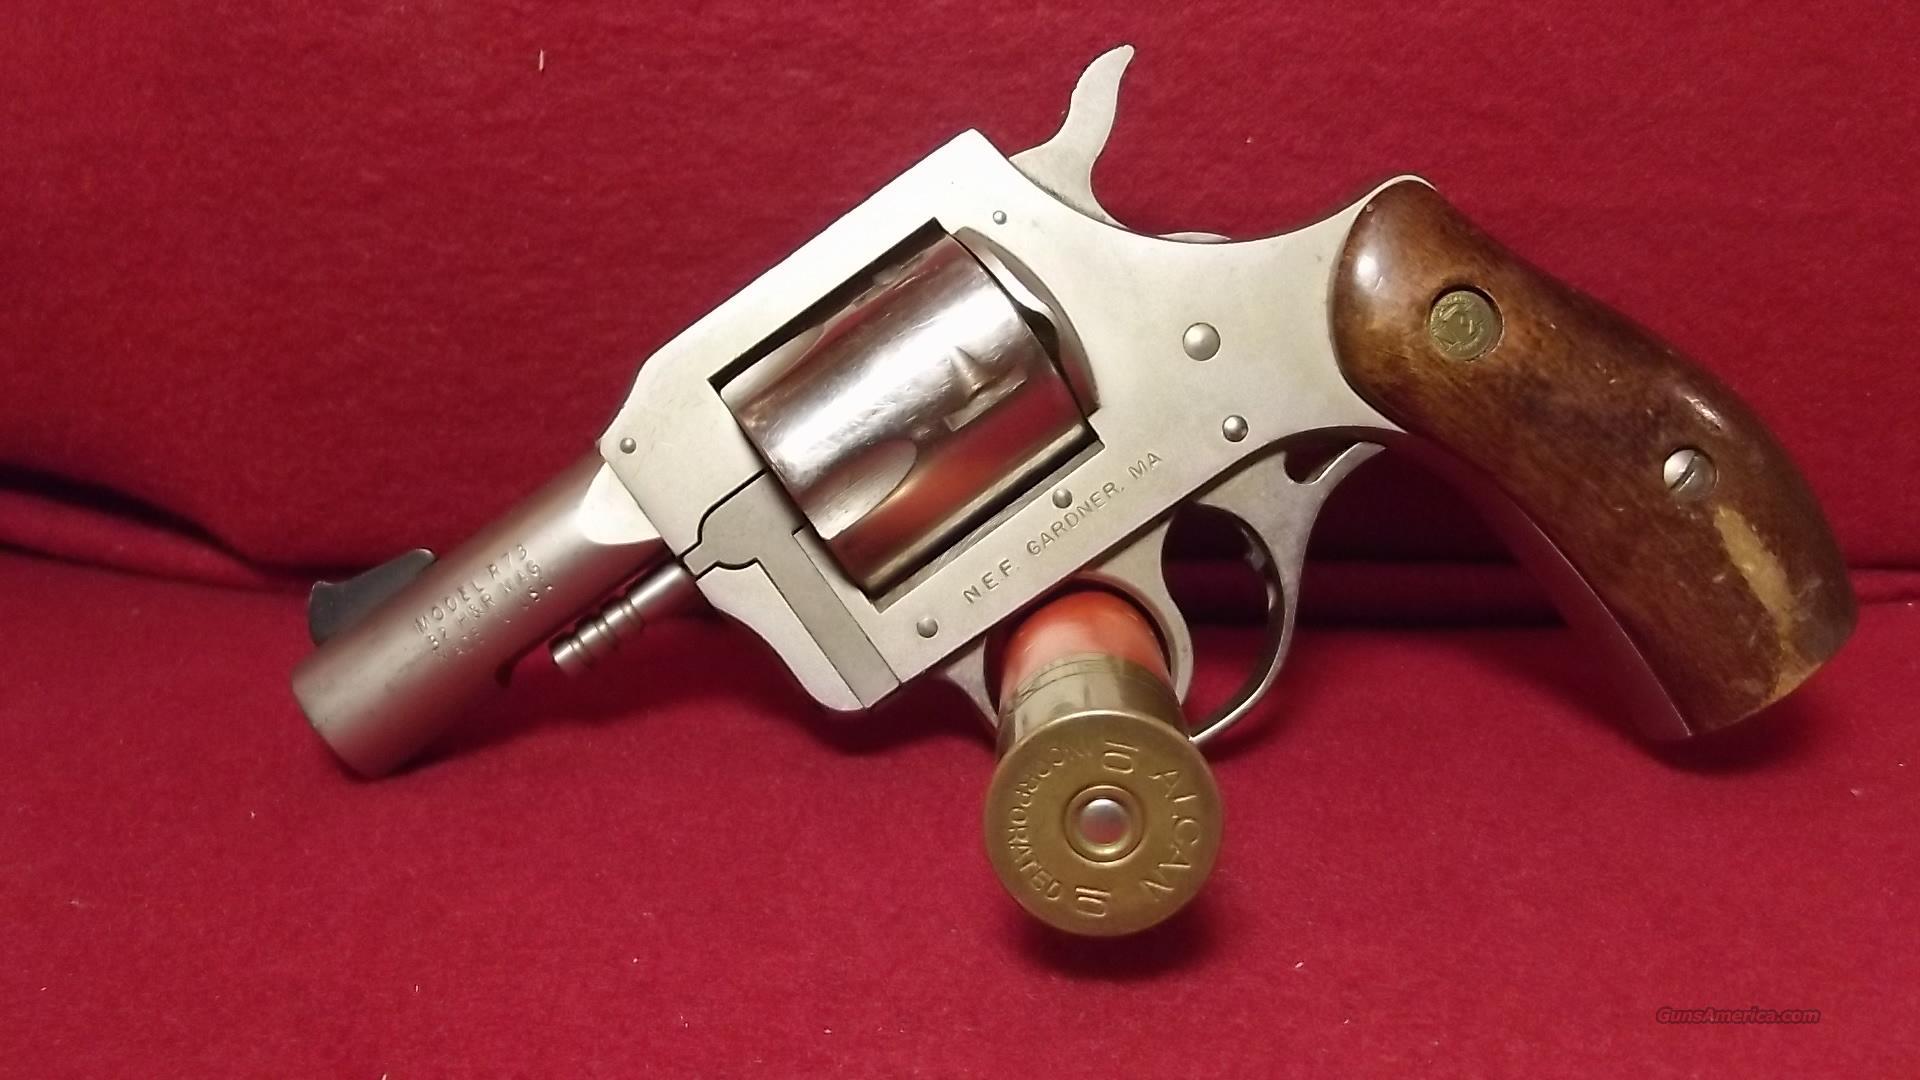 N.E.F Model R73   32 H&R Mag. Stainless  Guns > Pistols > New England Firearms (NEF) Pistols